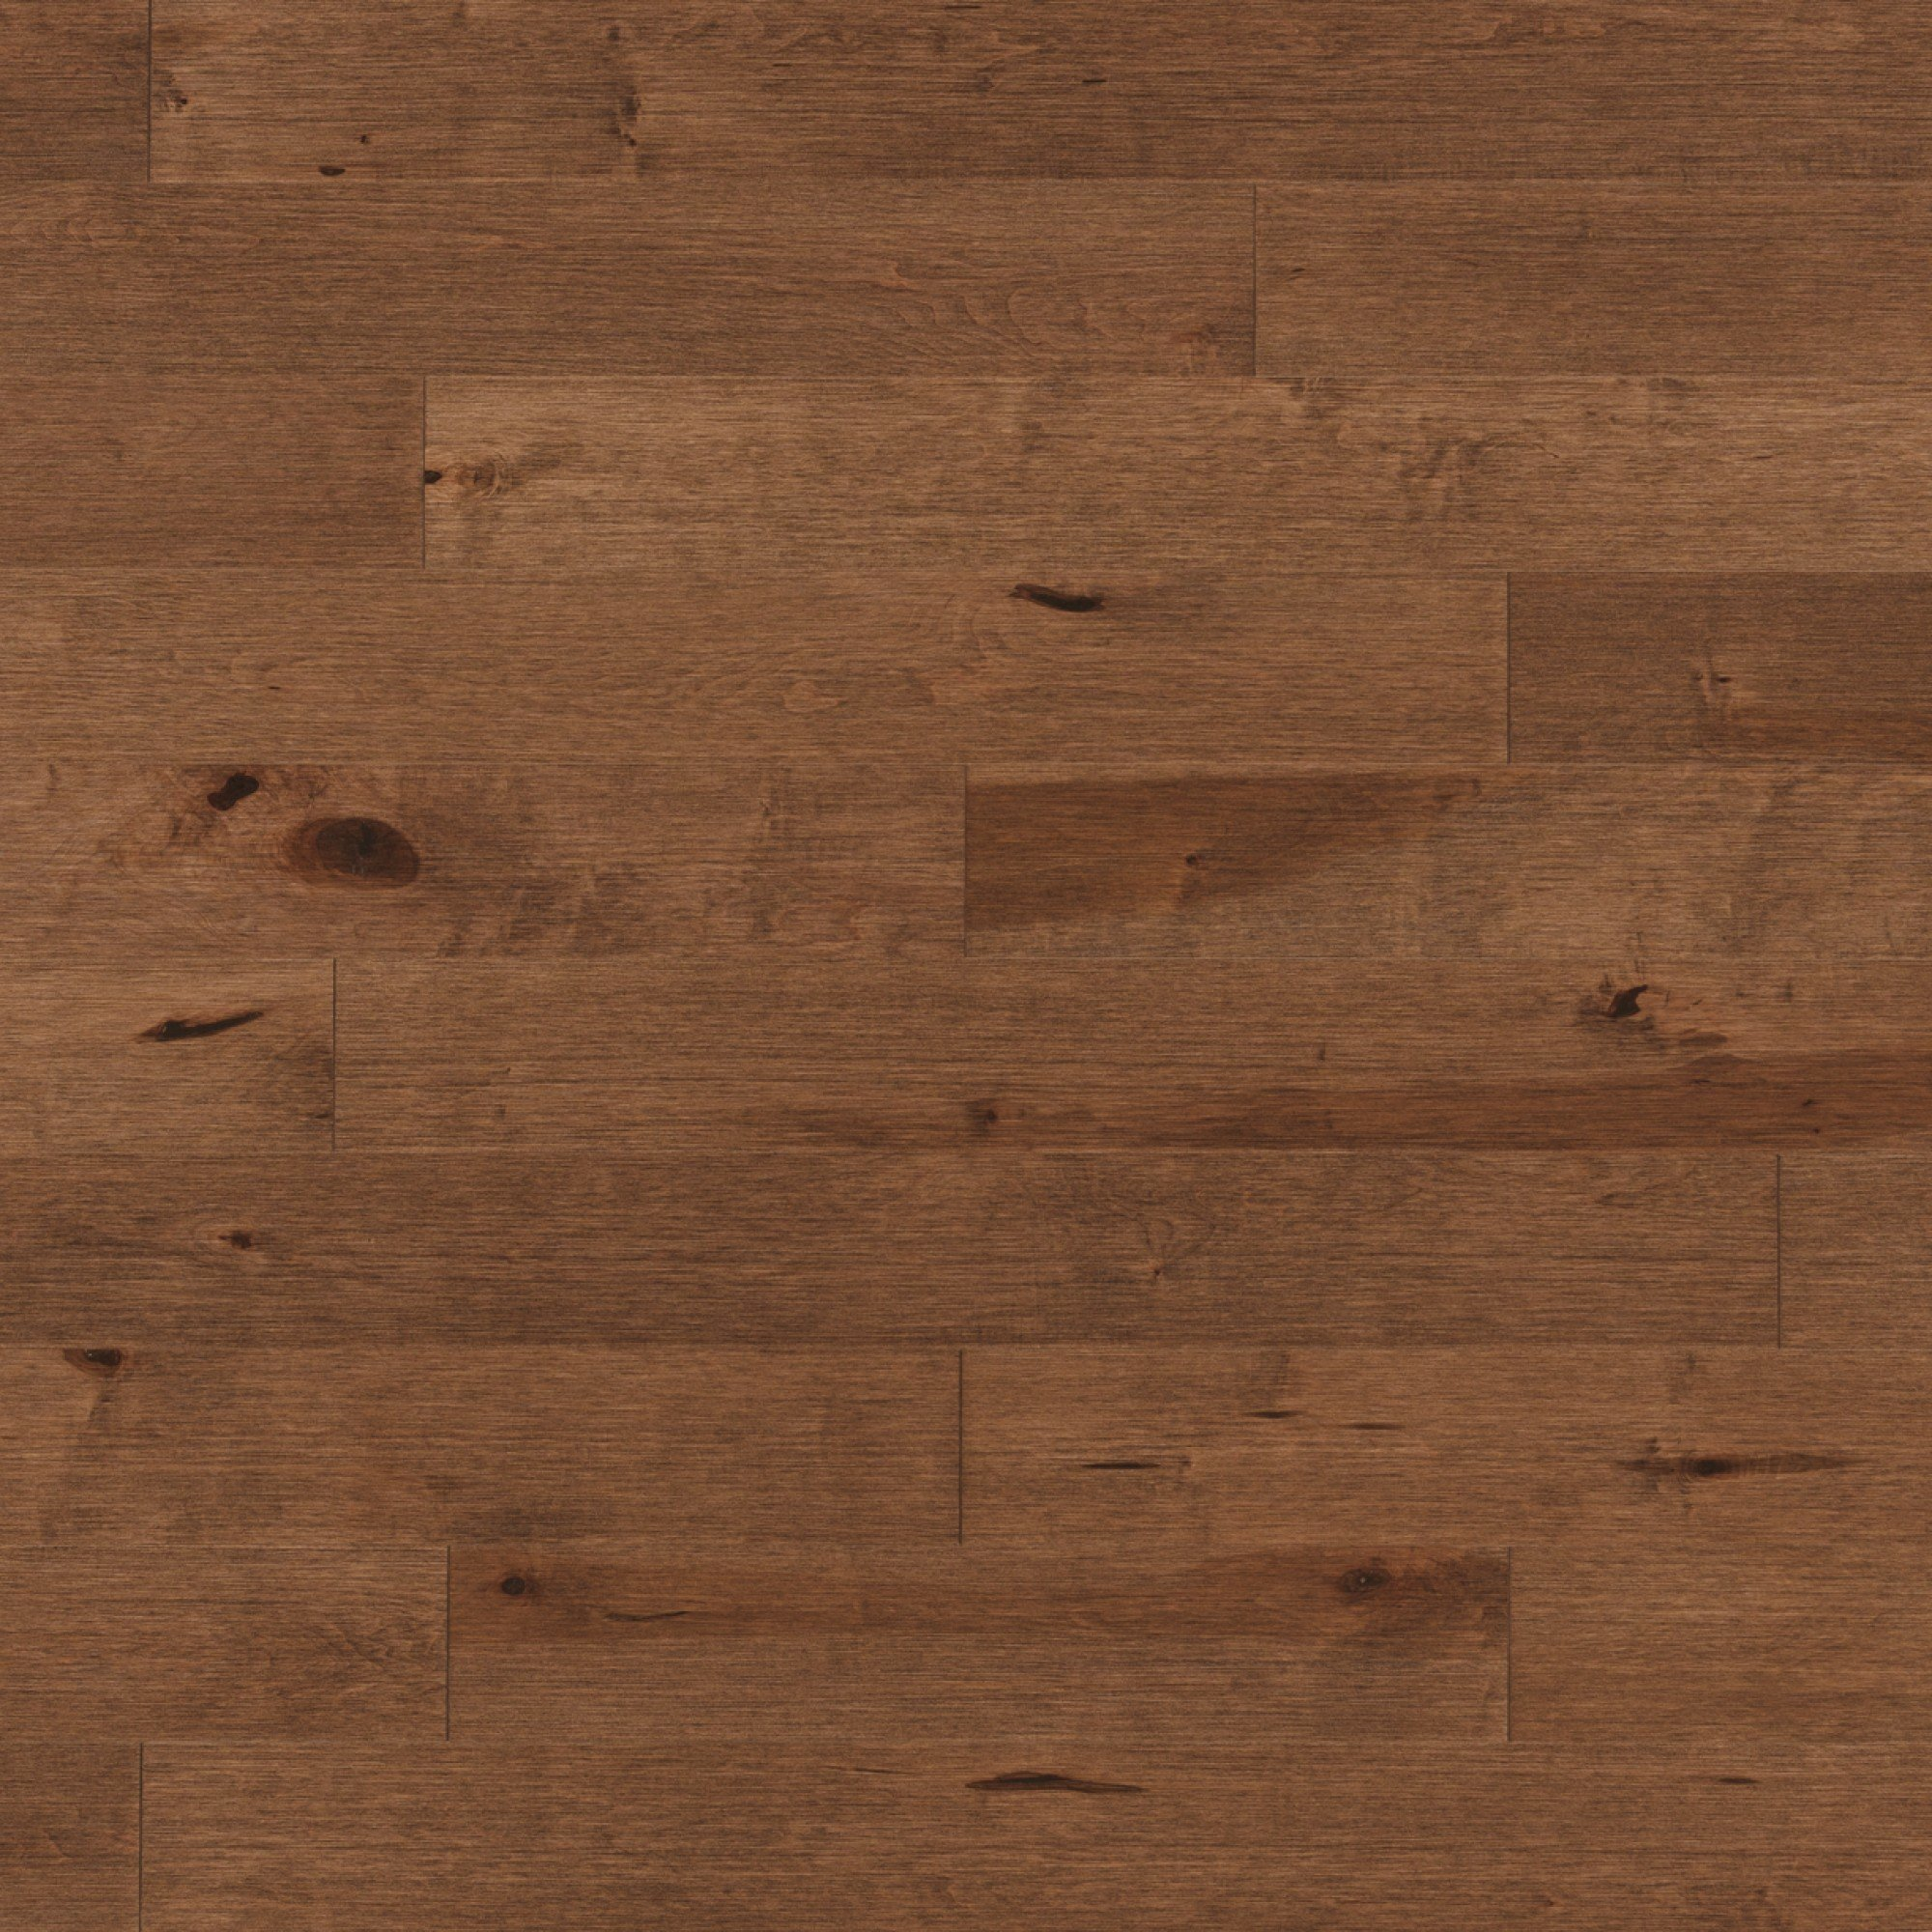 Maple Stillwater Character Engraved - Floor image